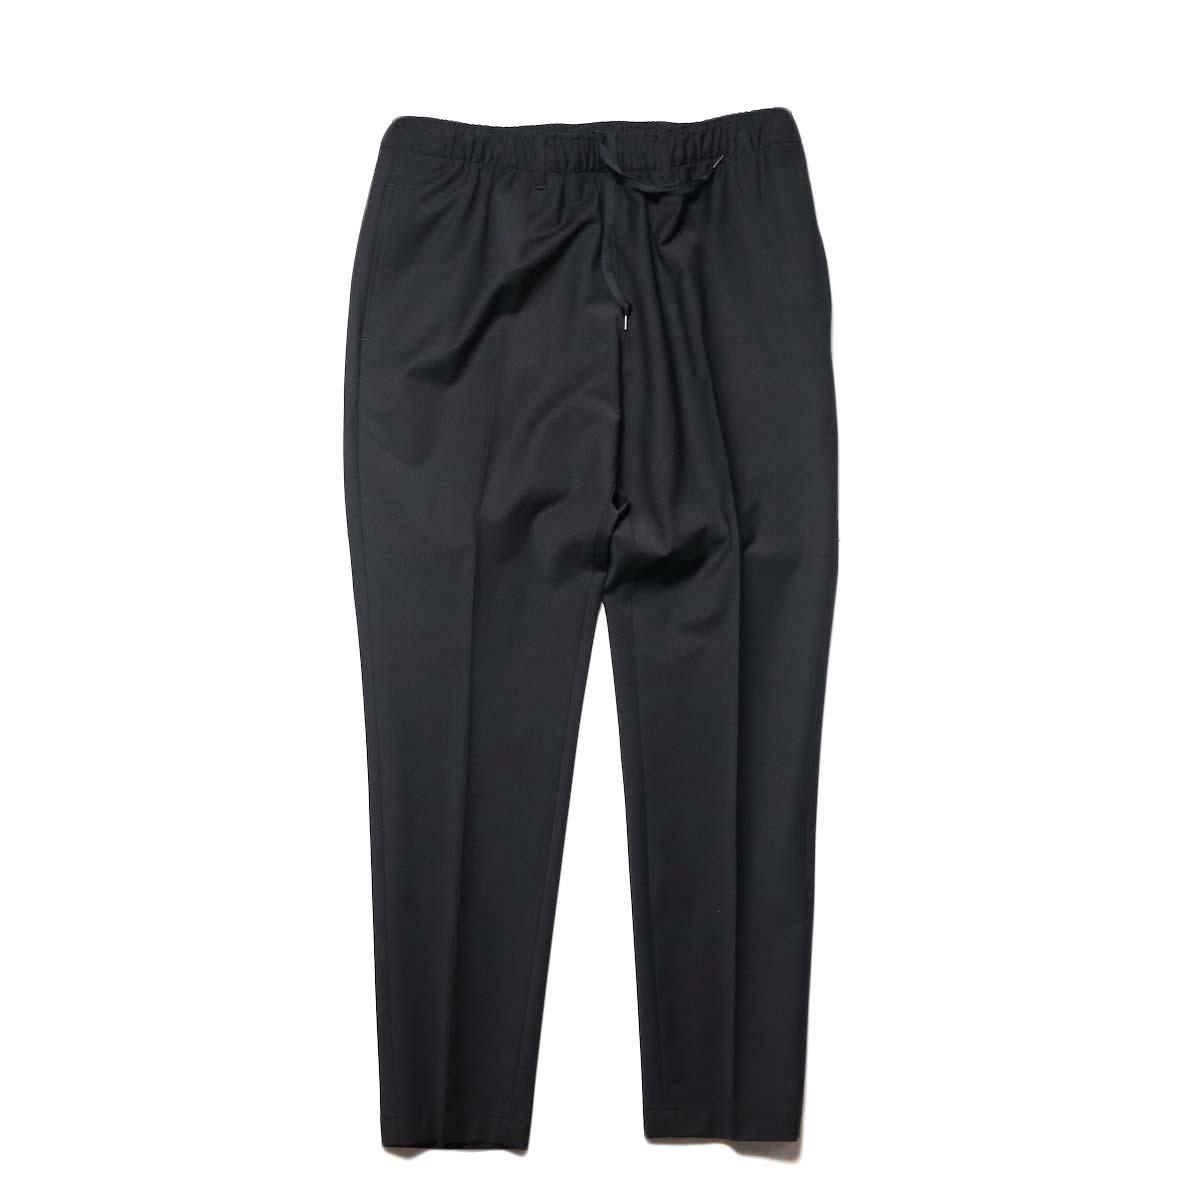 N.HOOLYWOOD / 2202-CP07-002 TAPERED EASY PANTS (Black)